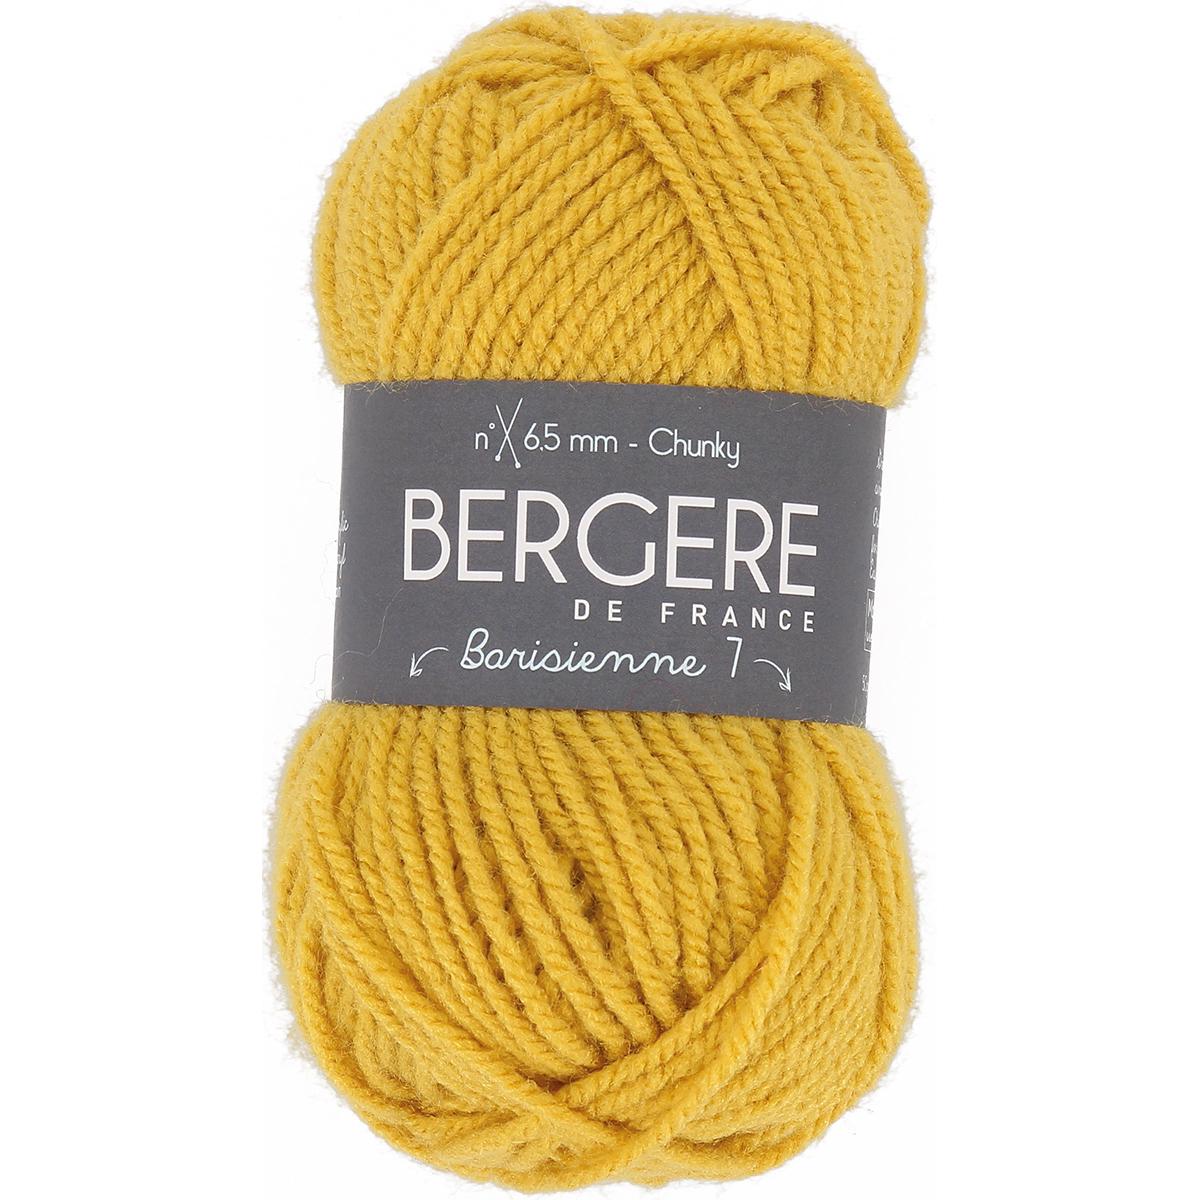 Bergere De France Barisienne 7 Yarn-Bananier - image 1 of 1